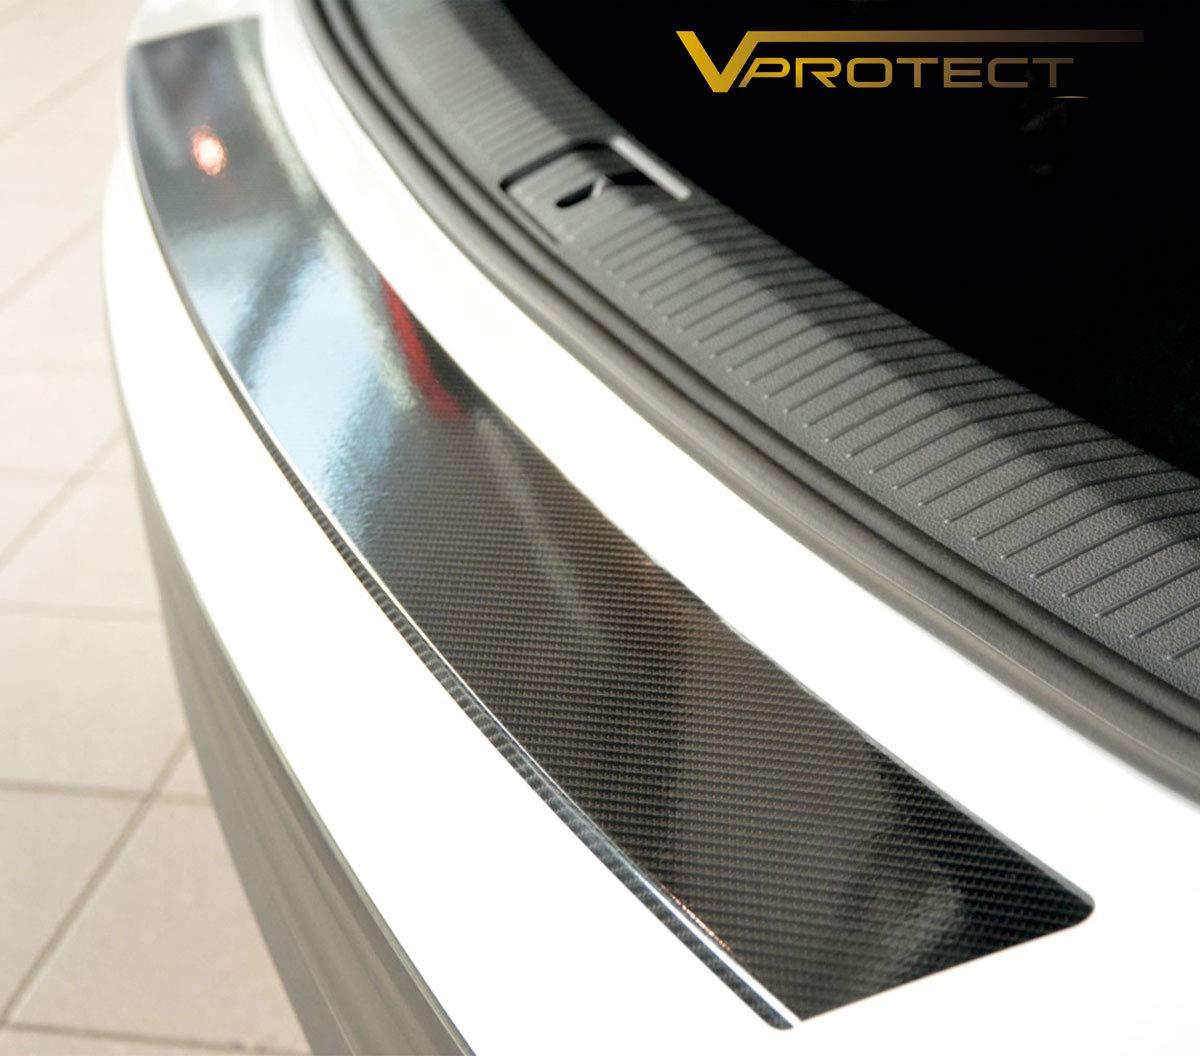 2023-602 V-Protect 5D Carbon Ladekantenschutz Lackschutzfolie Glanz